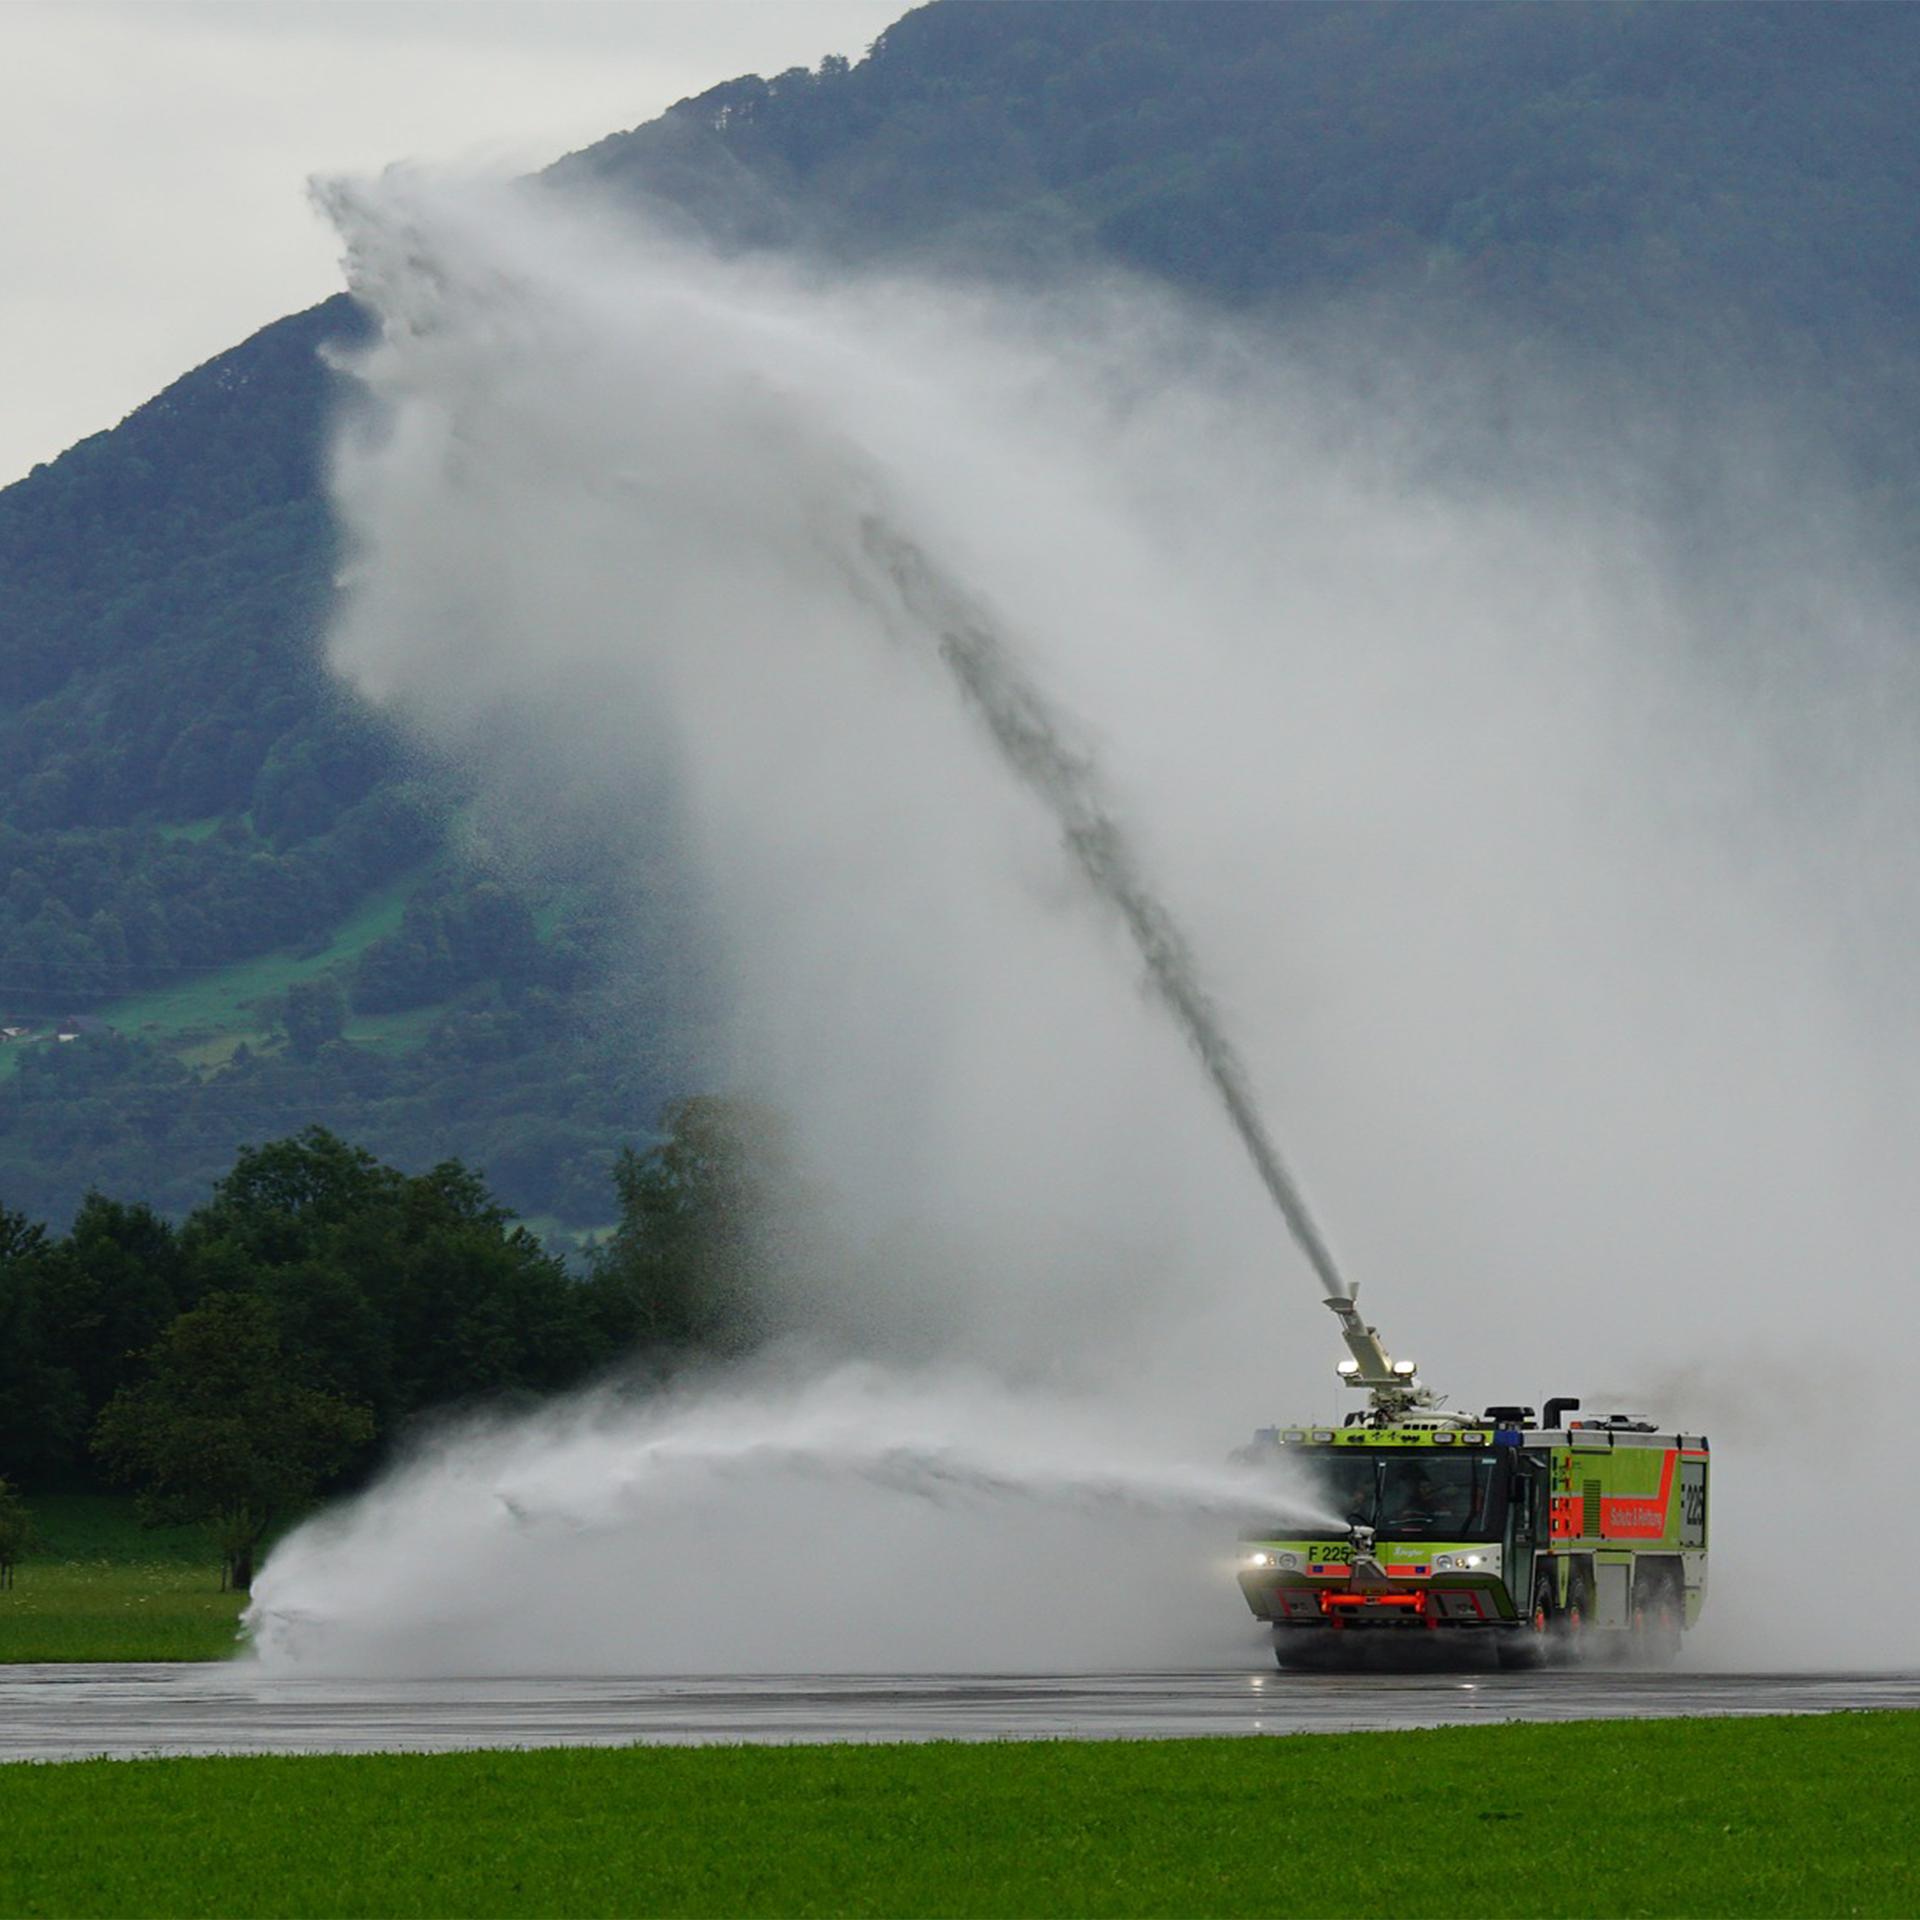 Use of Foam in Fire Fighting Applications